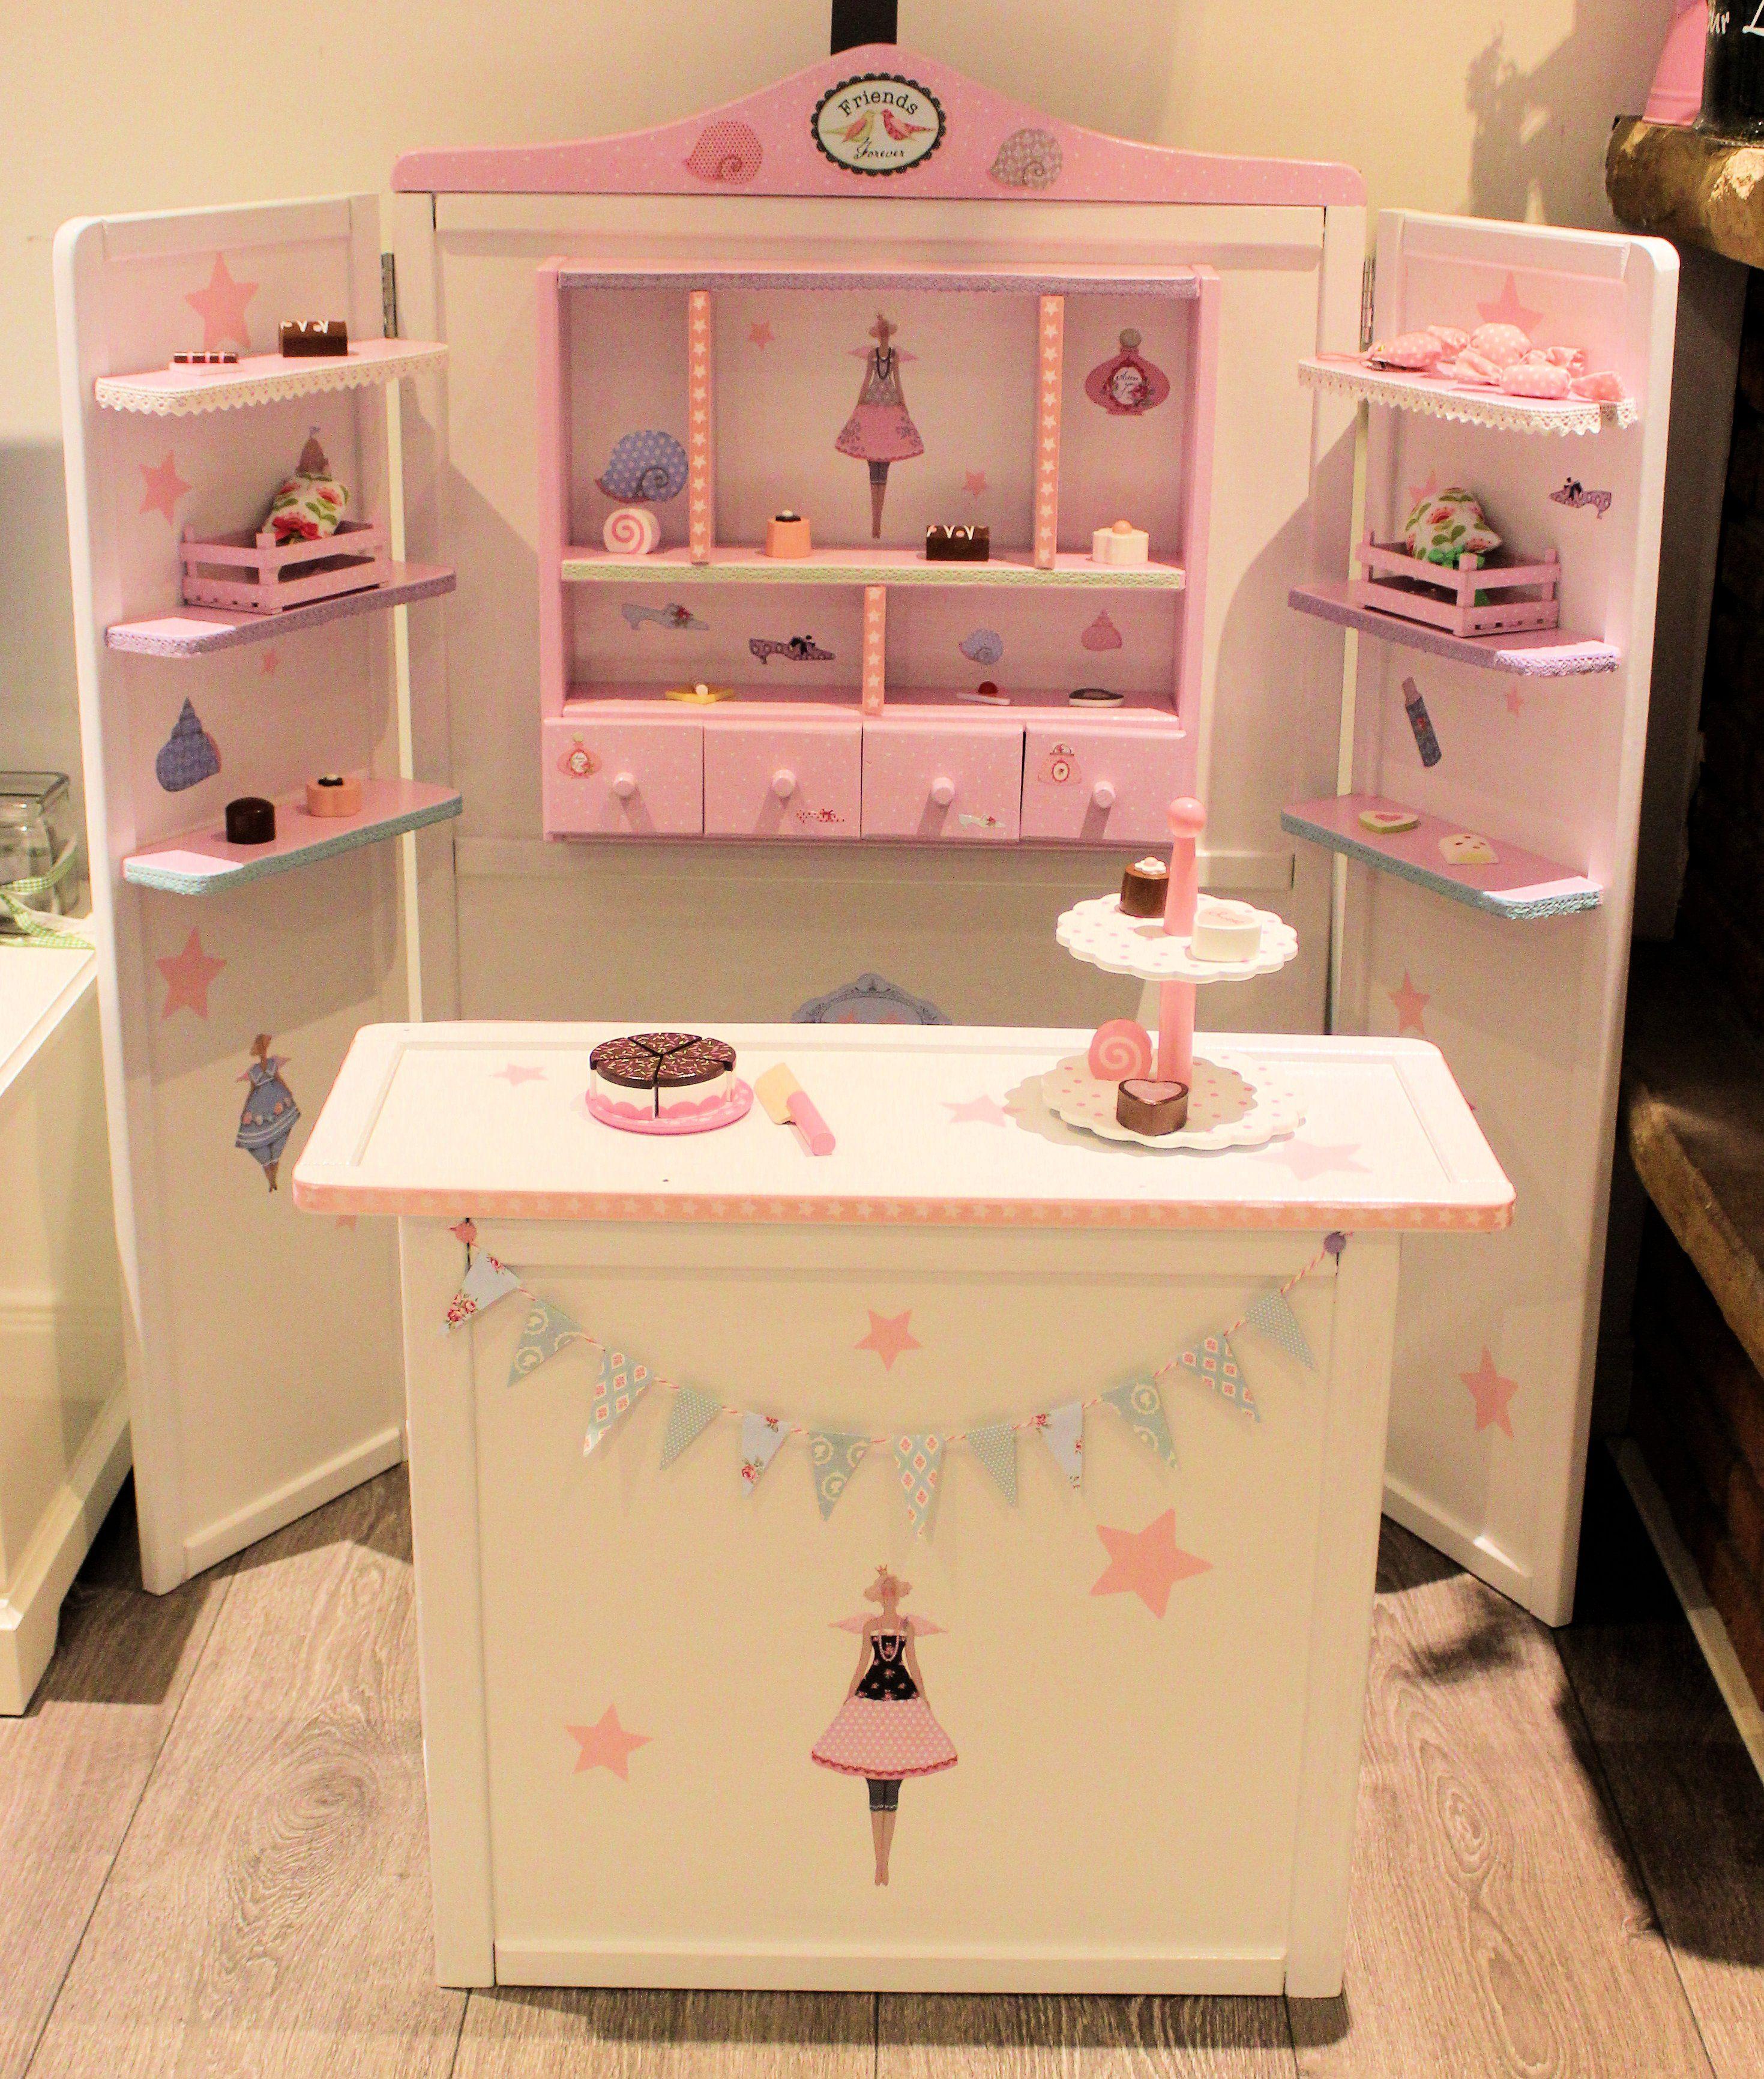 kaufladen weiß rosa tilda shabby | domis pusteblume | pinterest